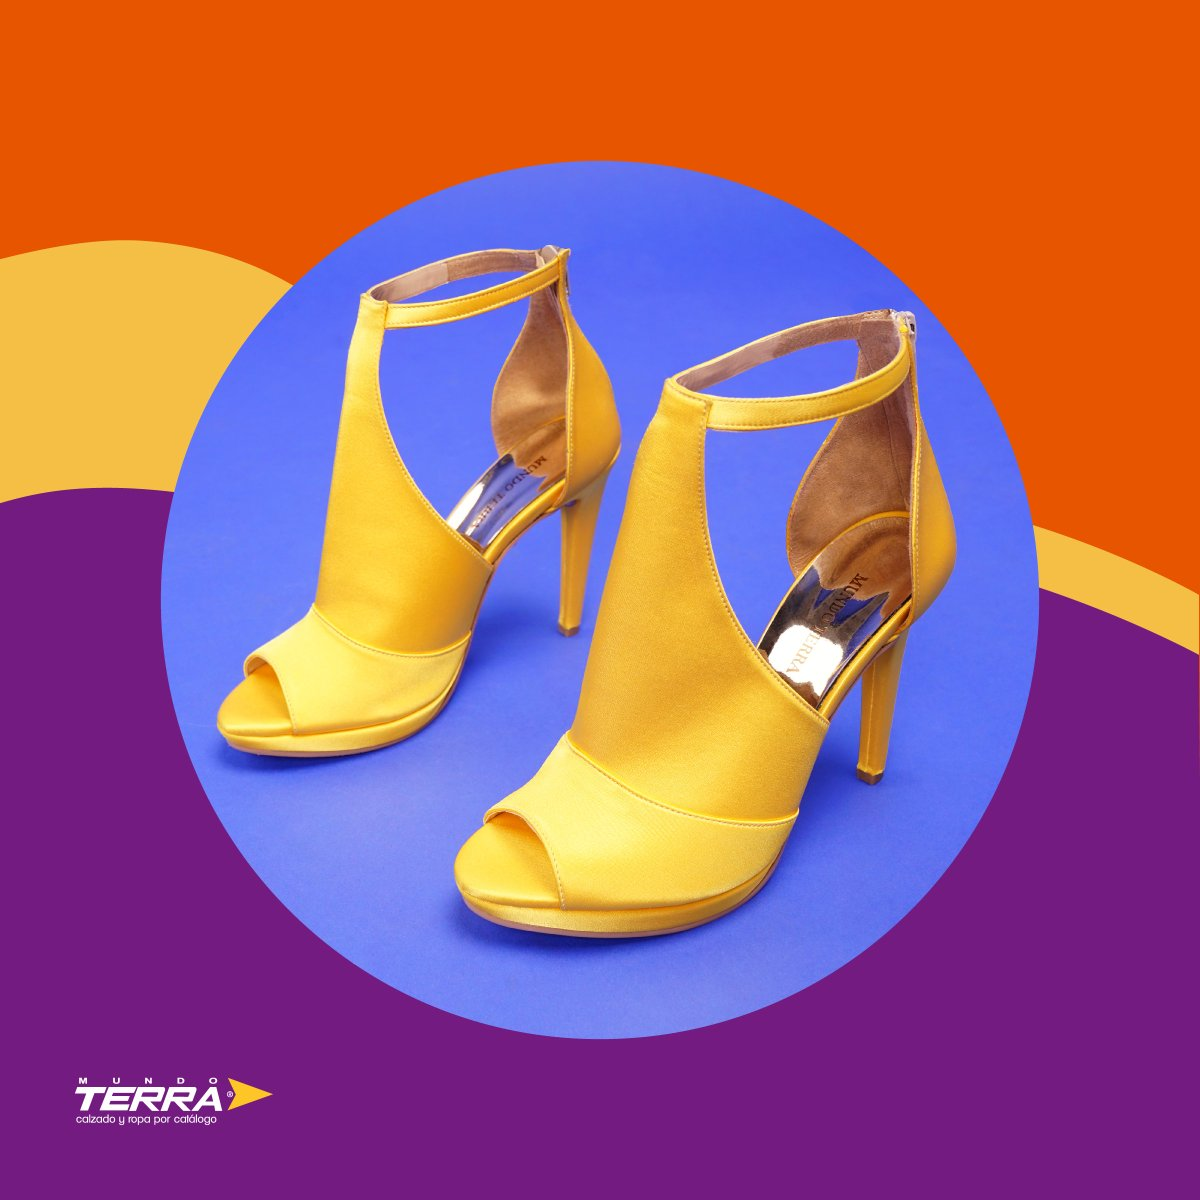 Hola, te presento a tu nuevo par favorito ;)  #mundoterra #heels #shoes #loveshoes https://t.co/BUAObe7eIm